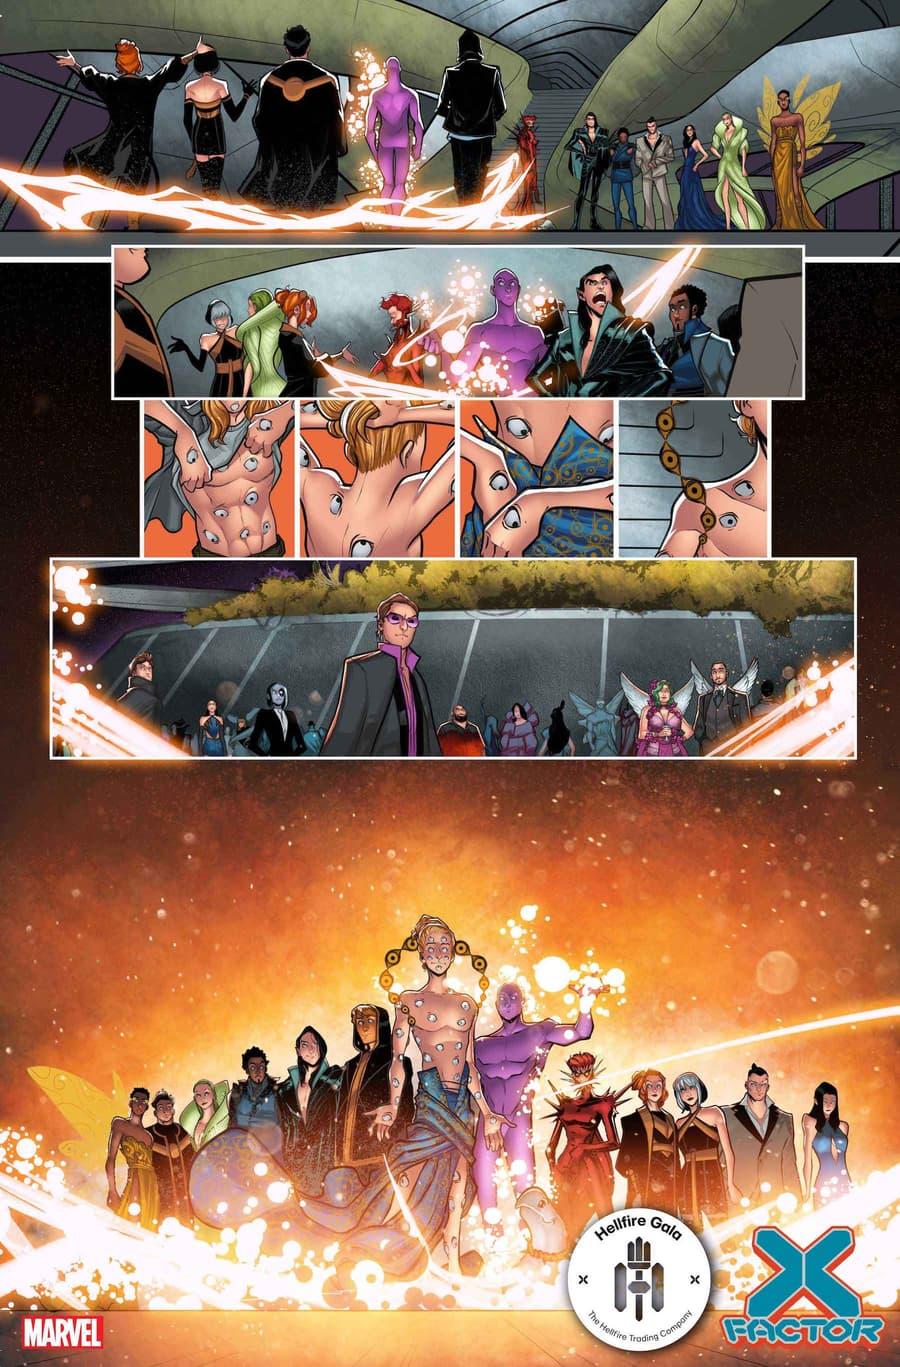 X-FACTOR #10 preview art by David Baldeón and Israel Silva